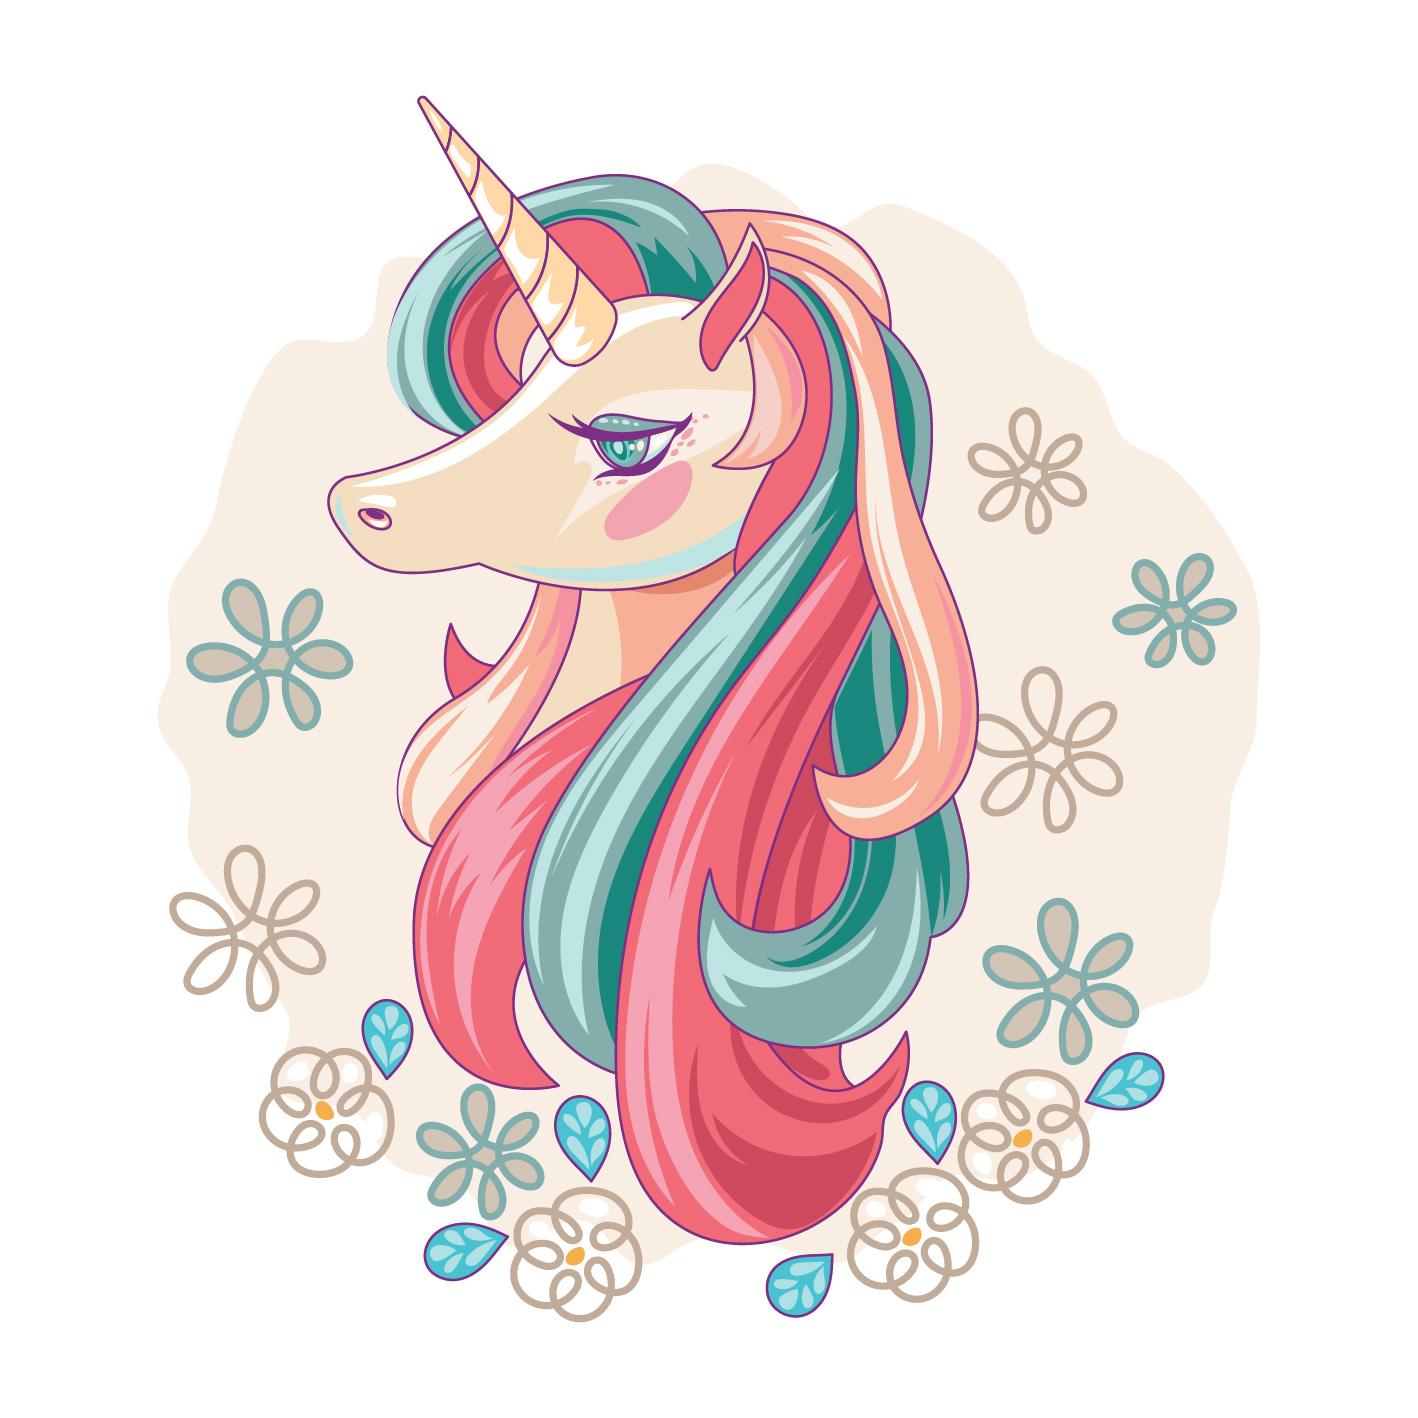 cute magic unicorn and horn 635704  download free vectors